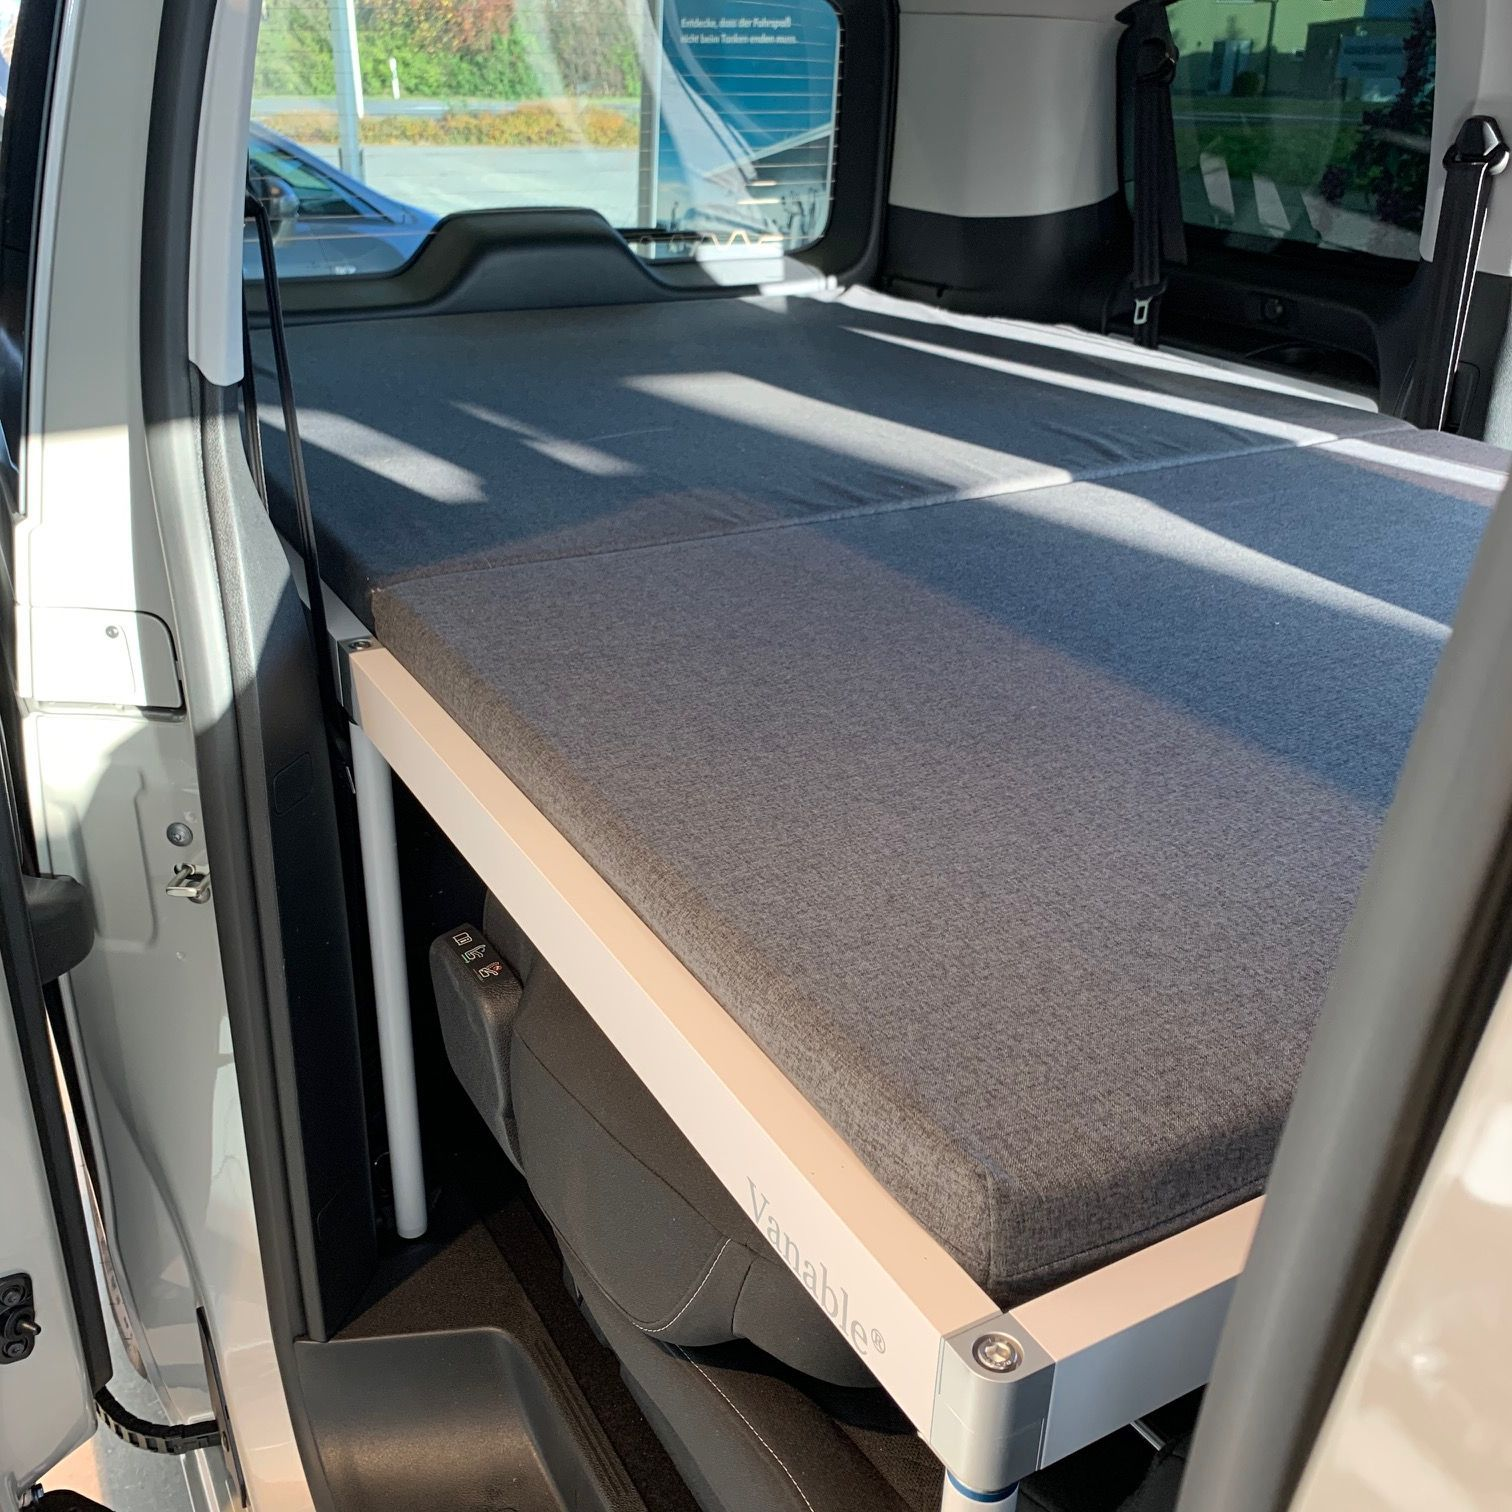 Opel Zafira Life M L2 Vanable Macht Jeden Van Zum Wohnmobil In 2020 Wohnmobil Kleintransporter Fahrzeuge